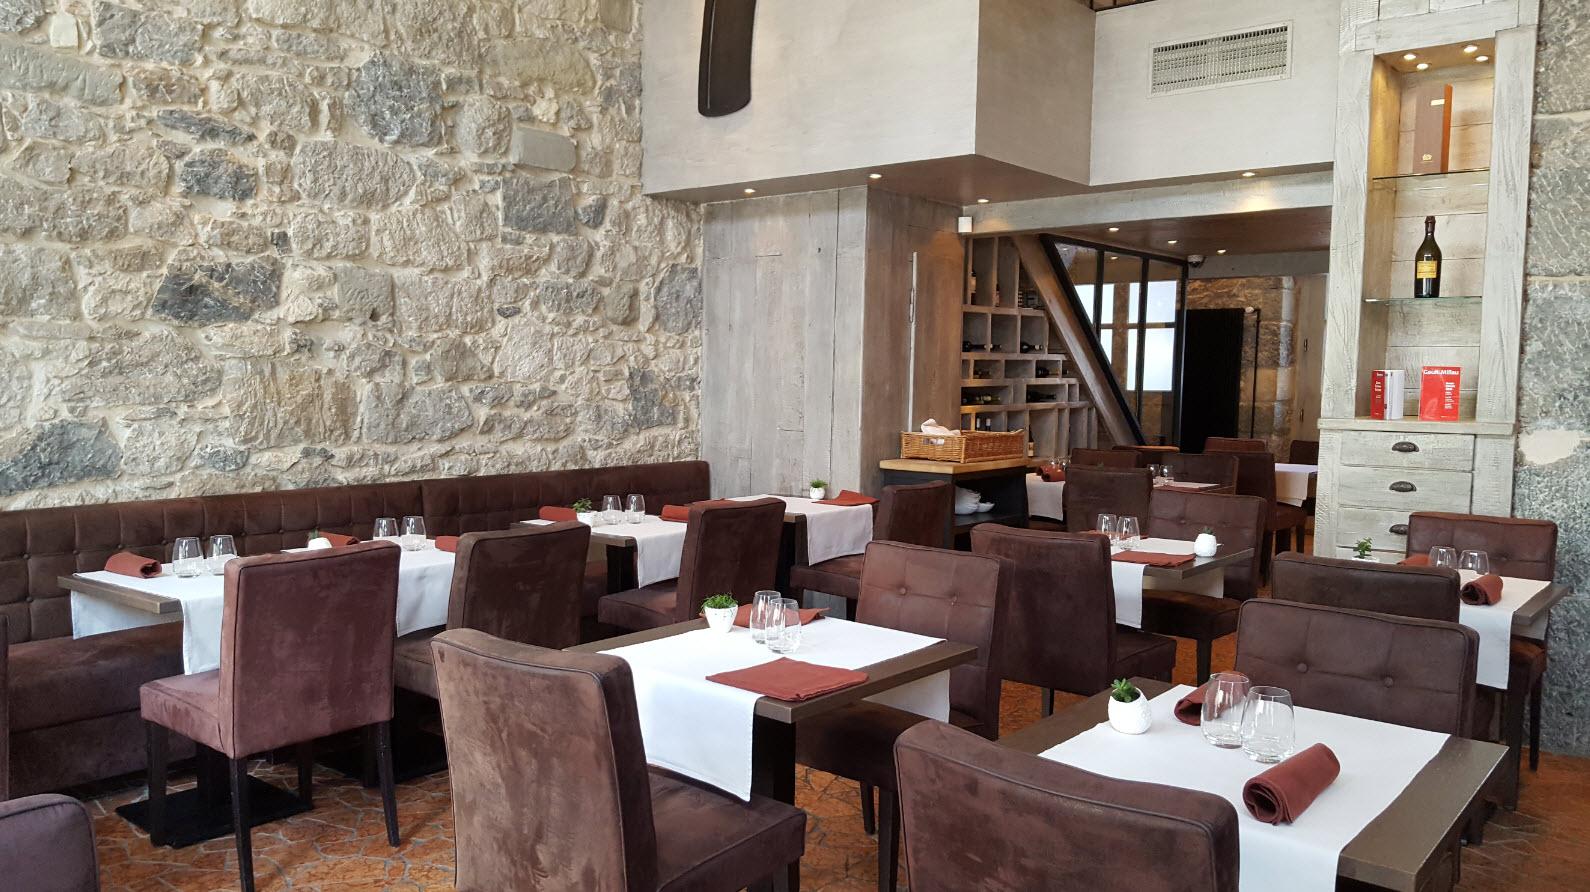 Restaurant bistronomique Geneve